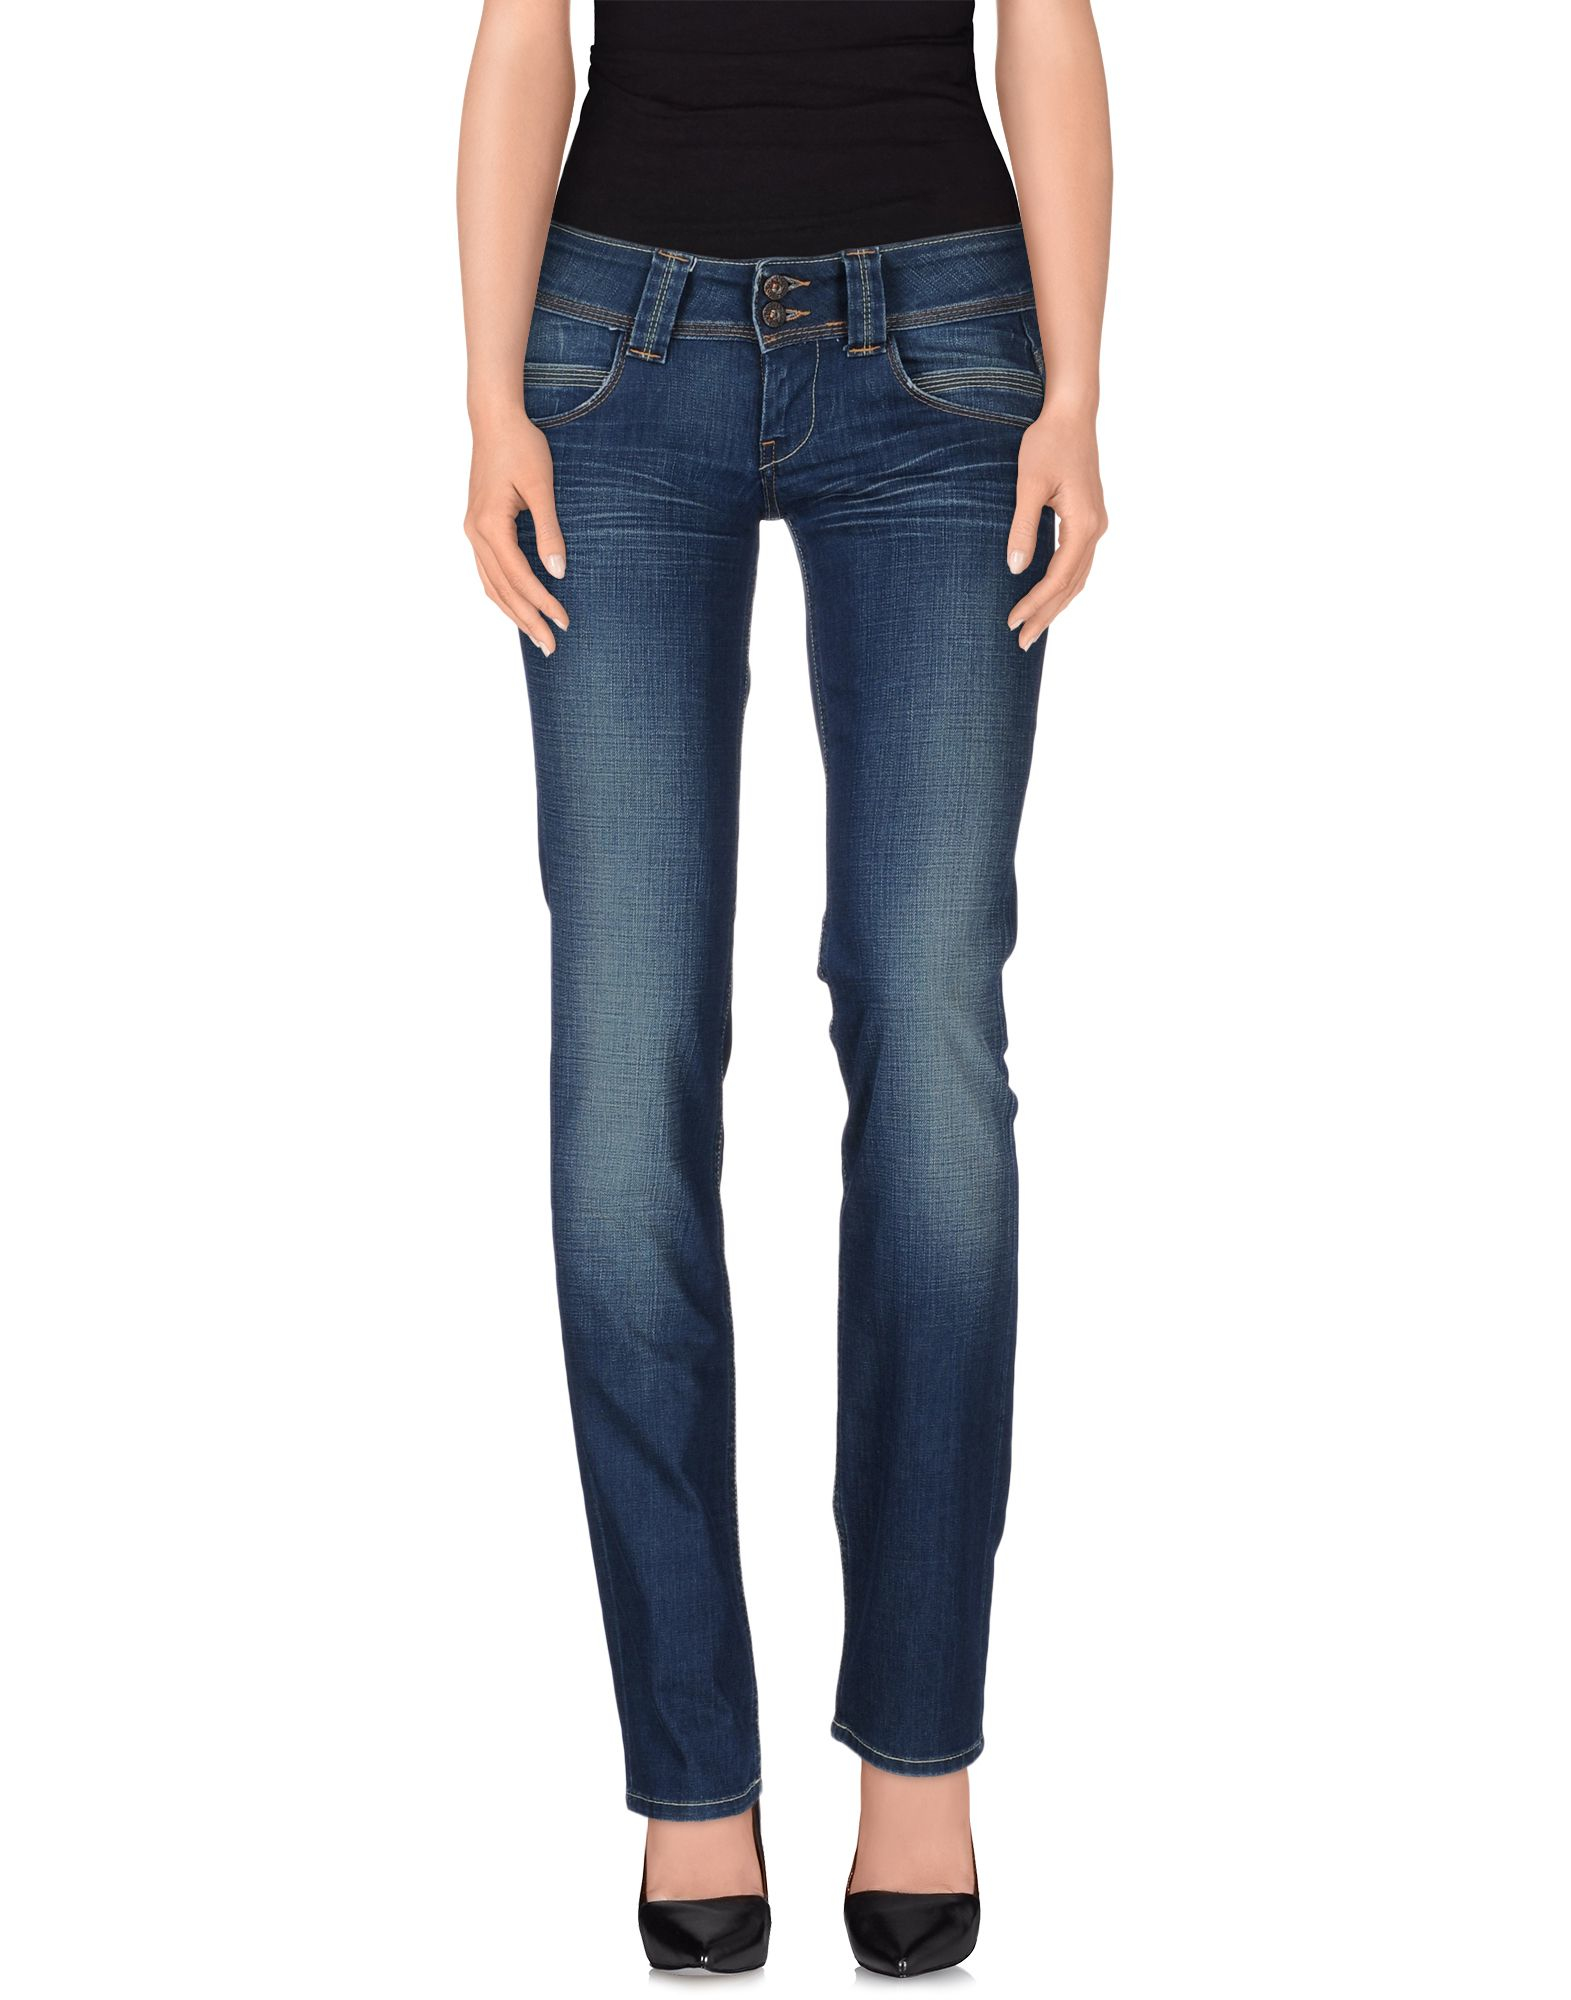 lyst pepe jeans denim trousers in blue. Black Bedroom Furniture Sets. Home Design Ideas